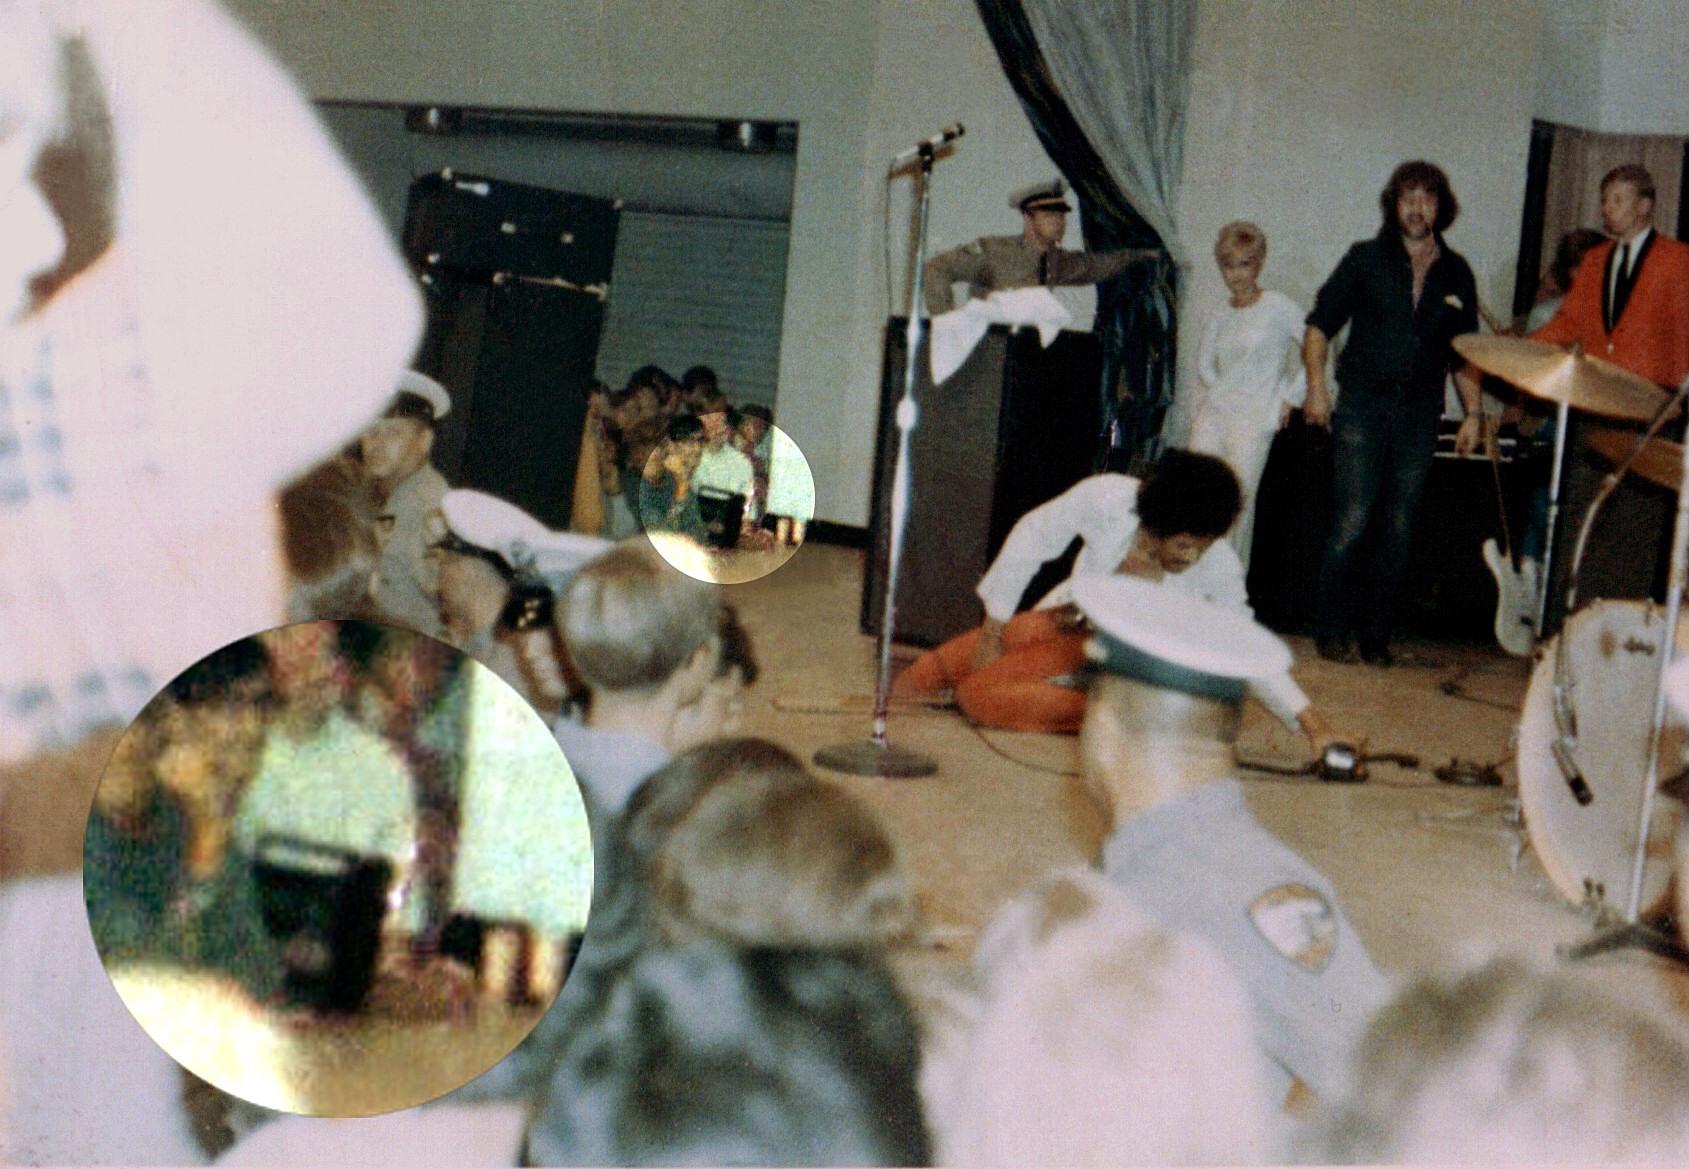 Virginia Beach (Civic Dome) : 21 août 1968 [Second concert] 72588419680821CivicDomeVirginiaBeach005aa